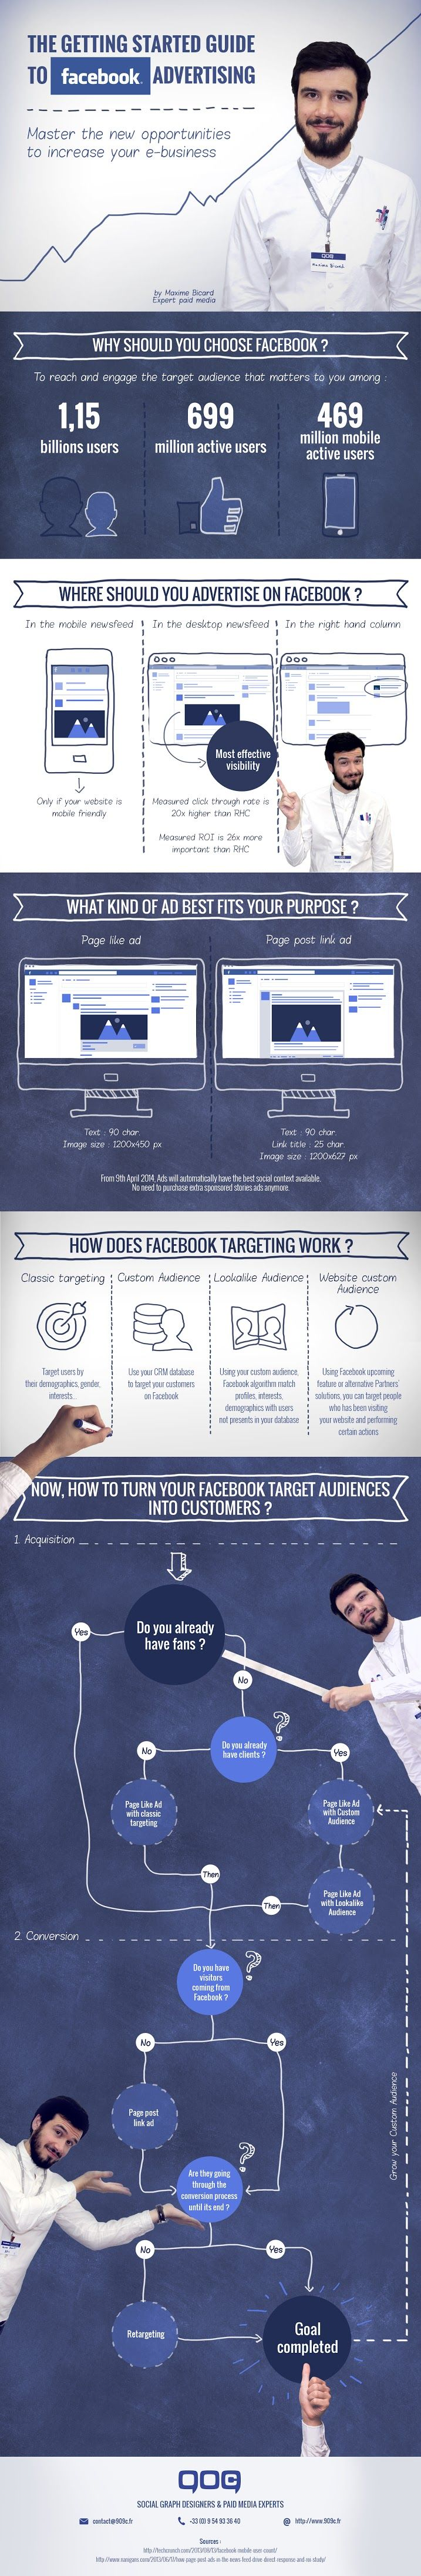 7 Infographics to Guide Your Facebook Marketing Strategy for 2014   Digital Information World #SEO #LocalSEO #SearchEngineOptimization #Google #SEM #SMM #Marketing #SocialMarketing